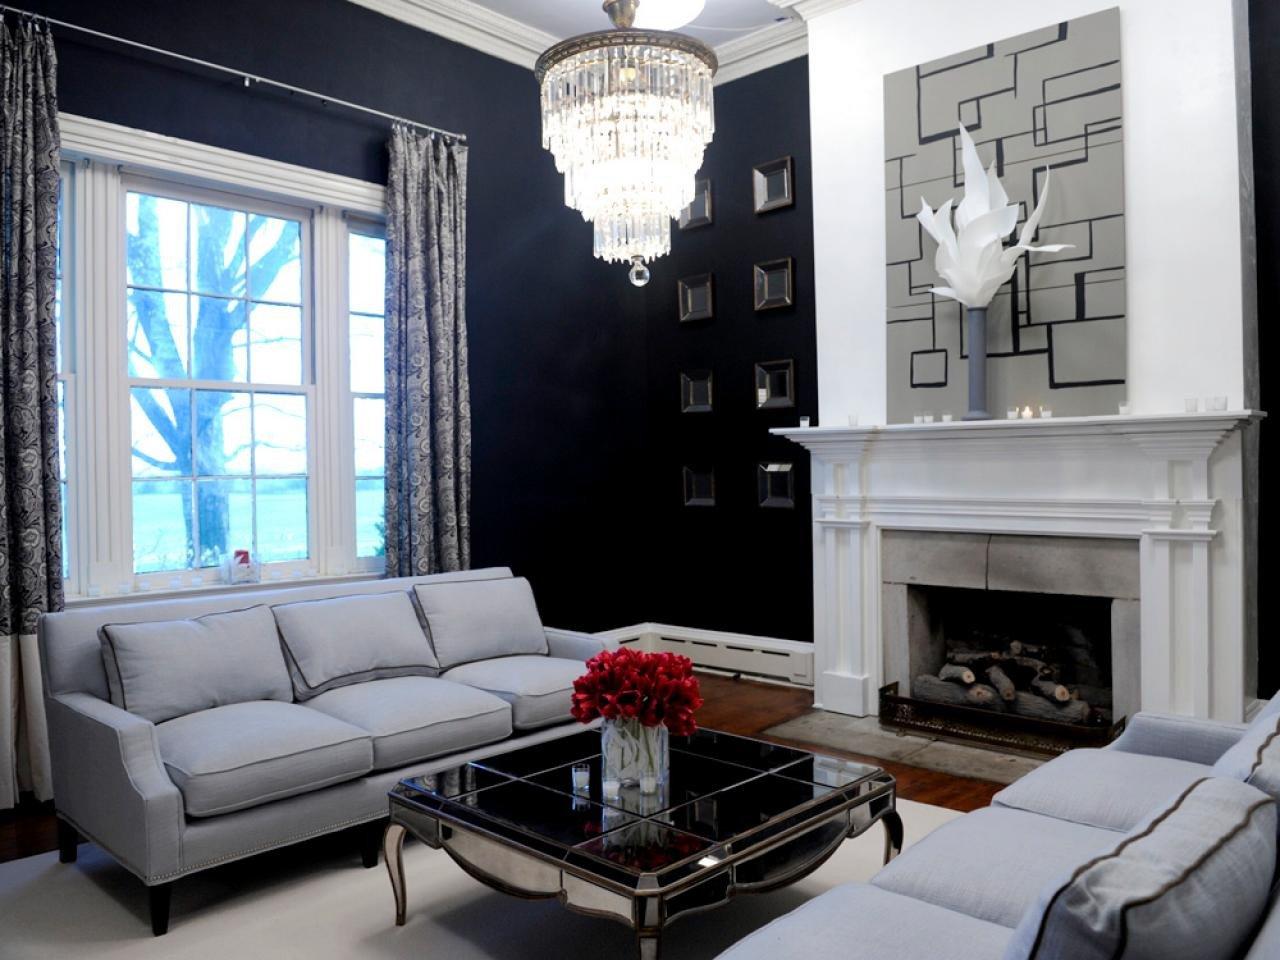 Modern Blue Living Room Decorating Ideas Fresh Modern Style for Classic Rooms Hgtv Design Star